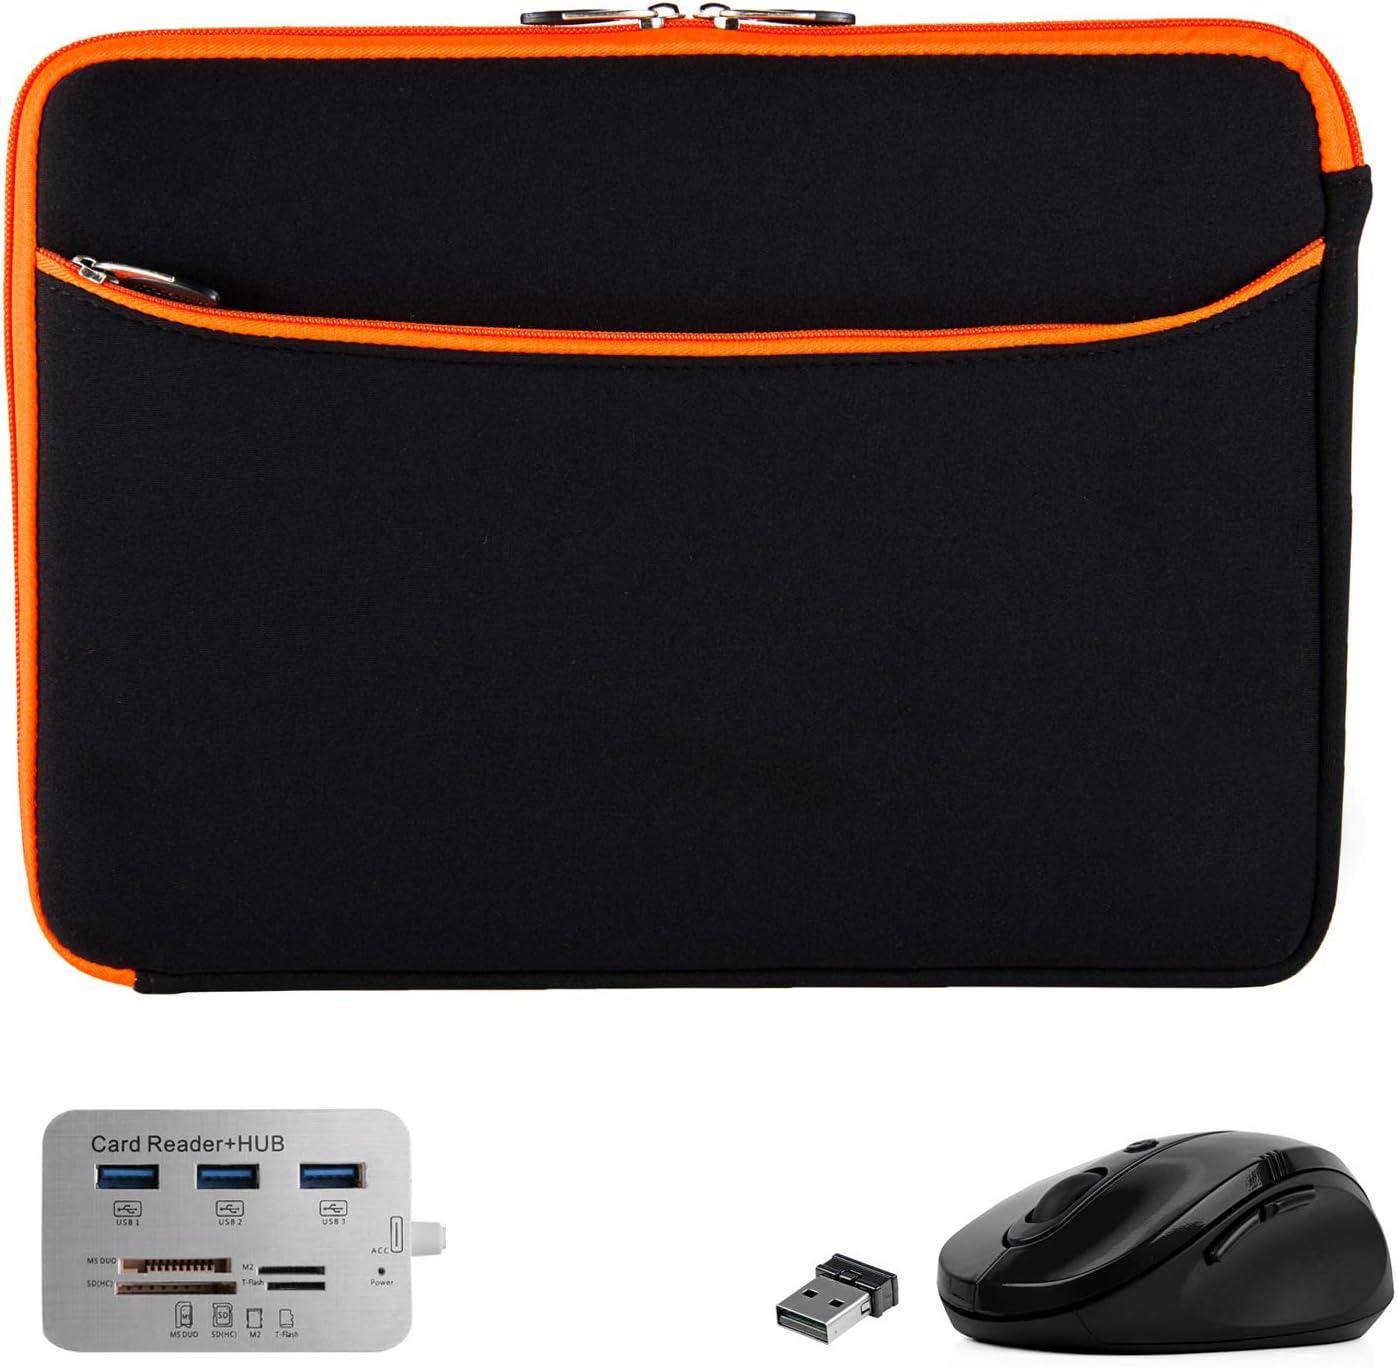 Mouse, Hub, Laptop Sleeve 15.6 inch for Dell Inspiron 3000 3505 3583 Latitude 7400 5400 7480 E7470, Gaming G3 15 3500, Vostro, Precision (Black Orange)